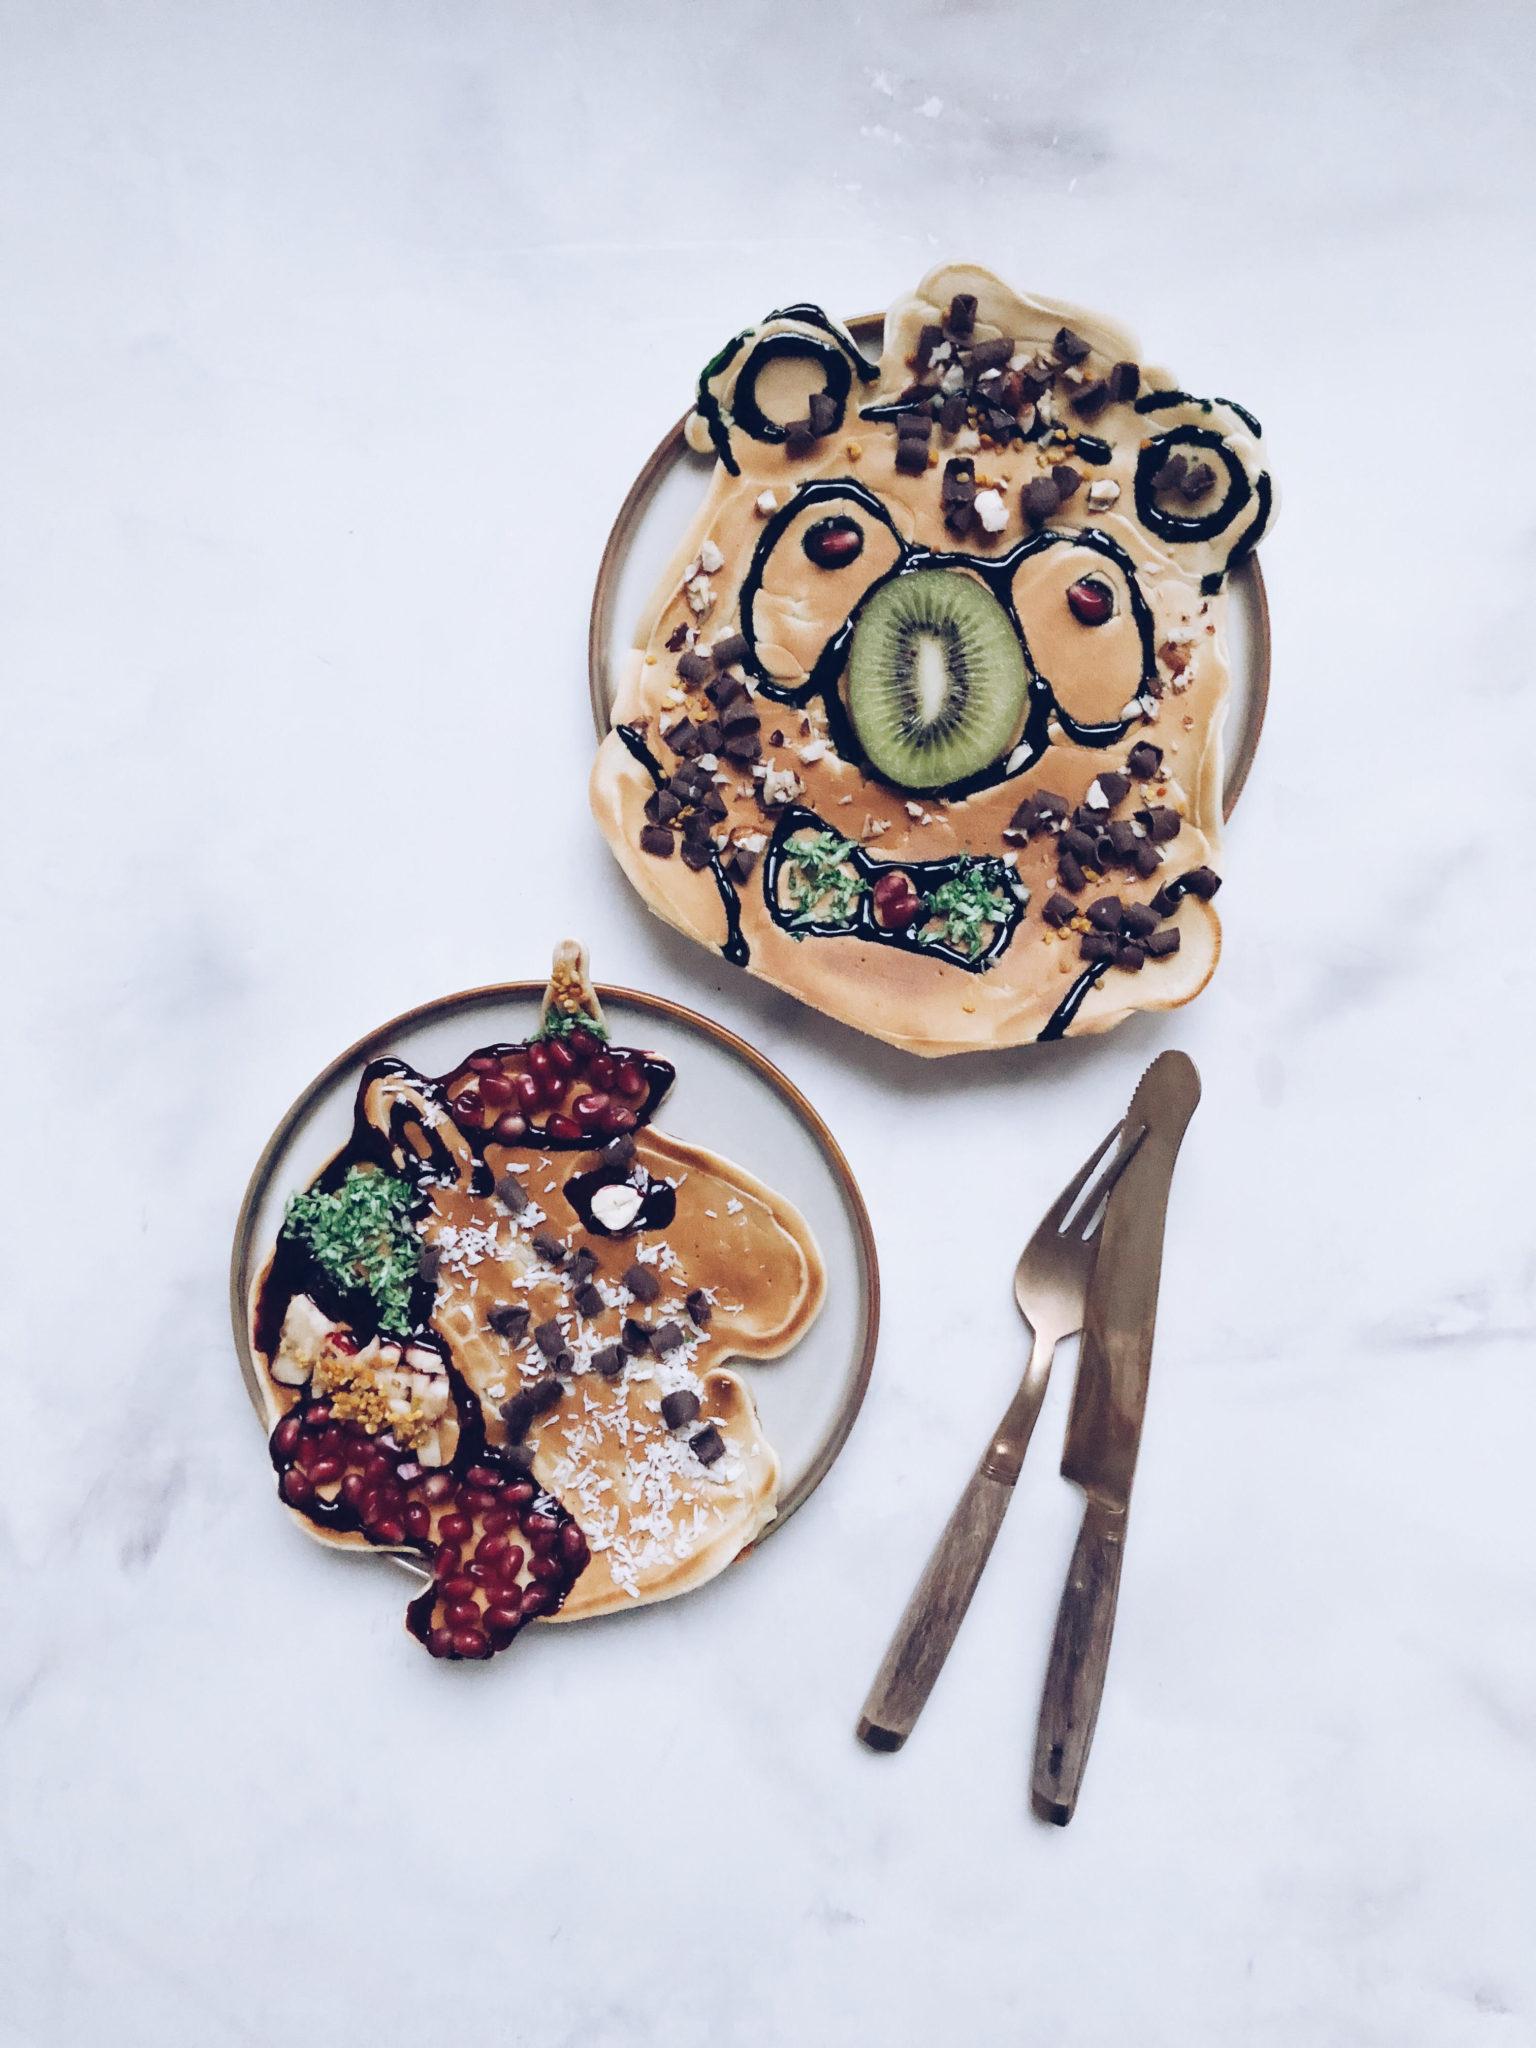 pandekager opskrift Tefal Creative Pan